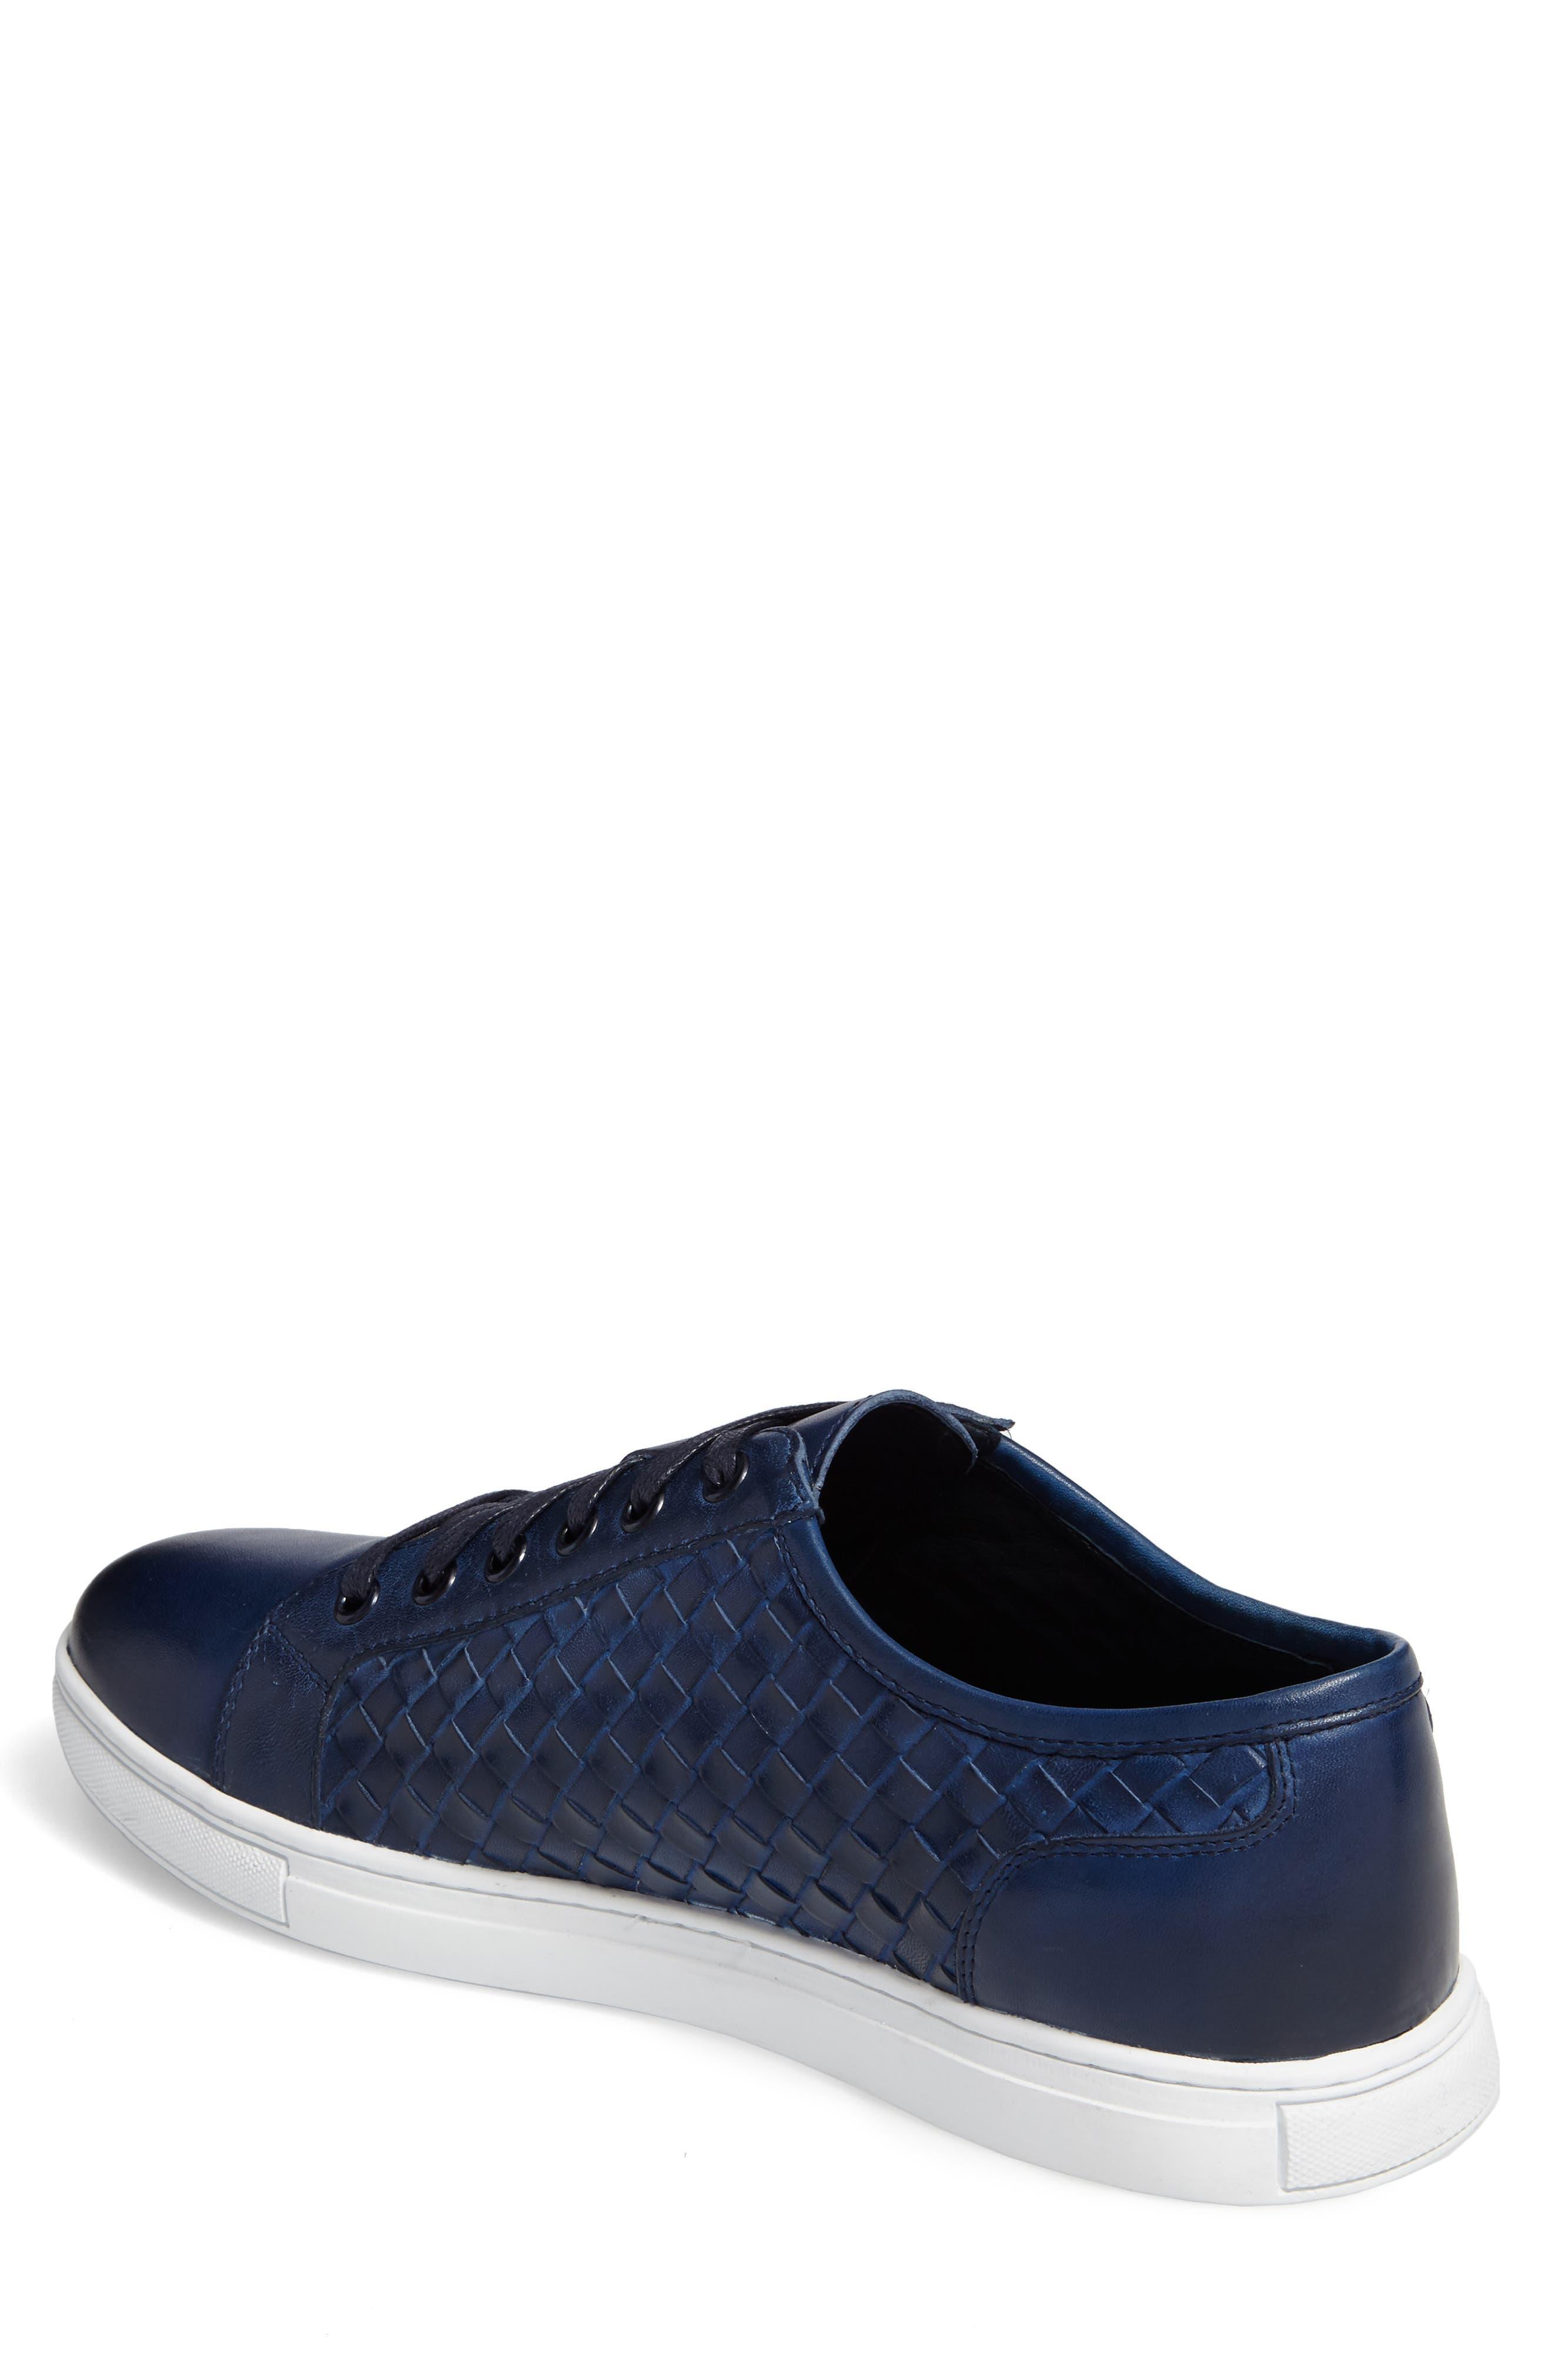 Fader Sneaker,                             Alternate thumbnail 10, color,